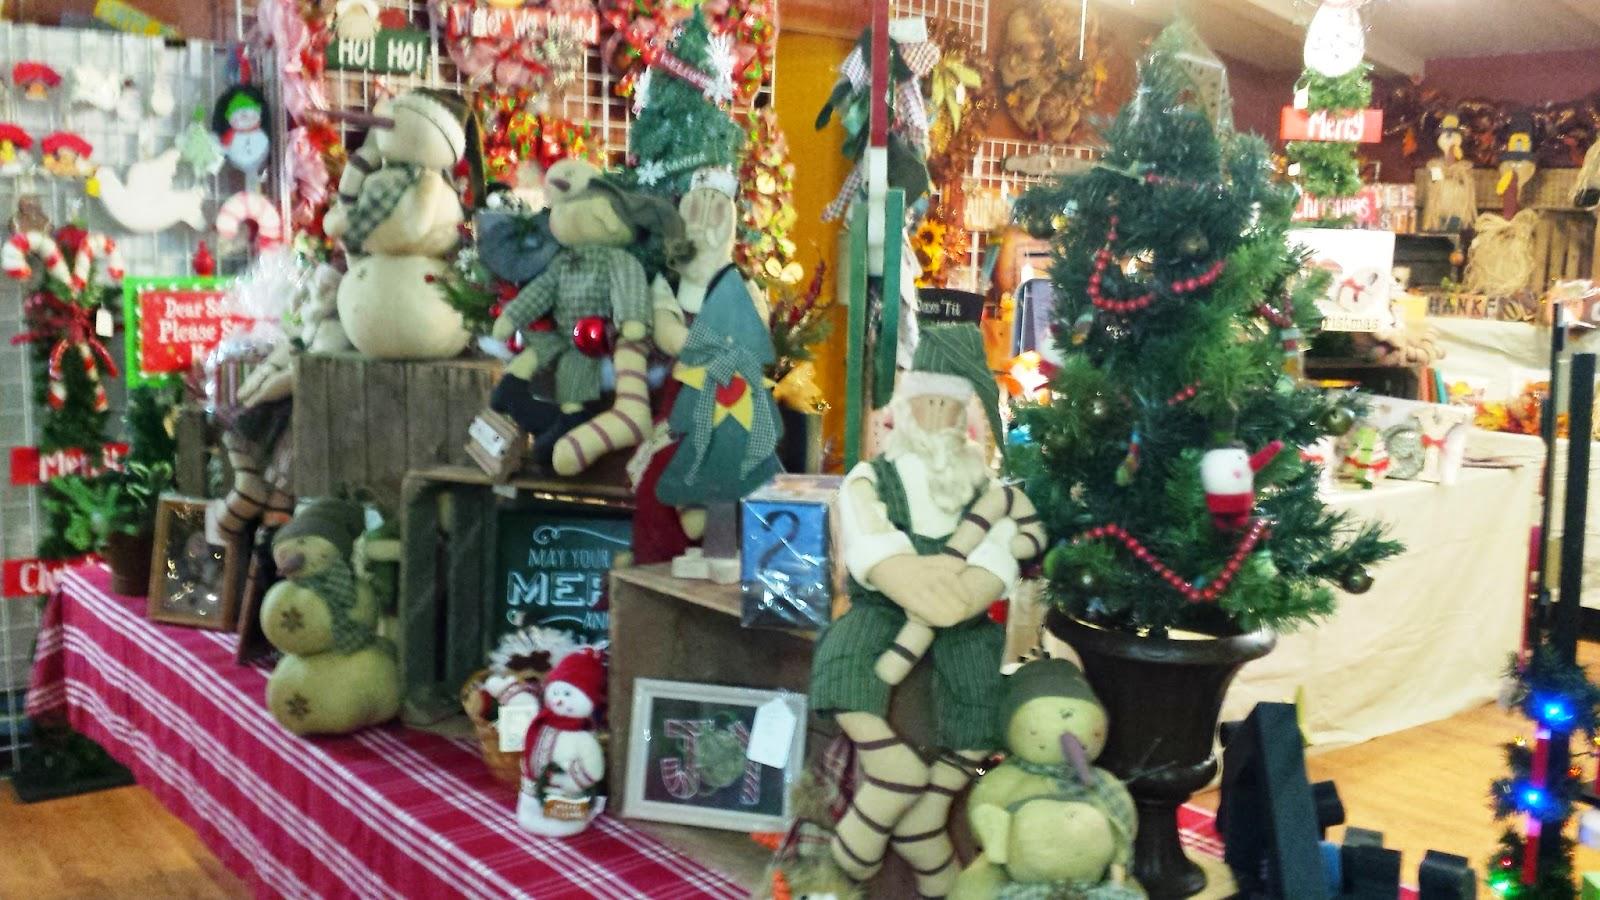 Craft Show Stuffed Animal Display